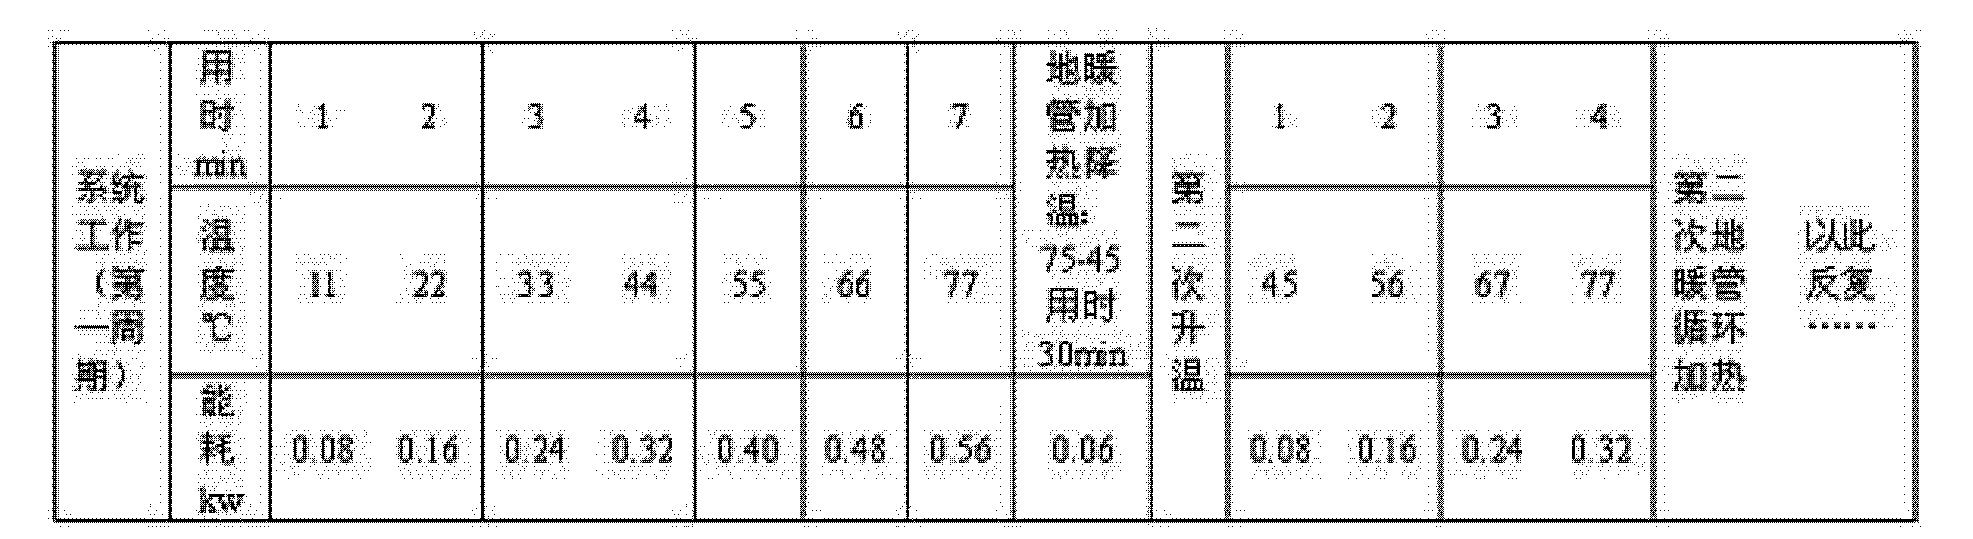 Figure CN202885089UD00041